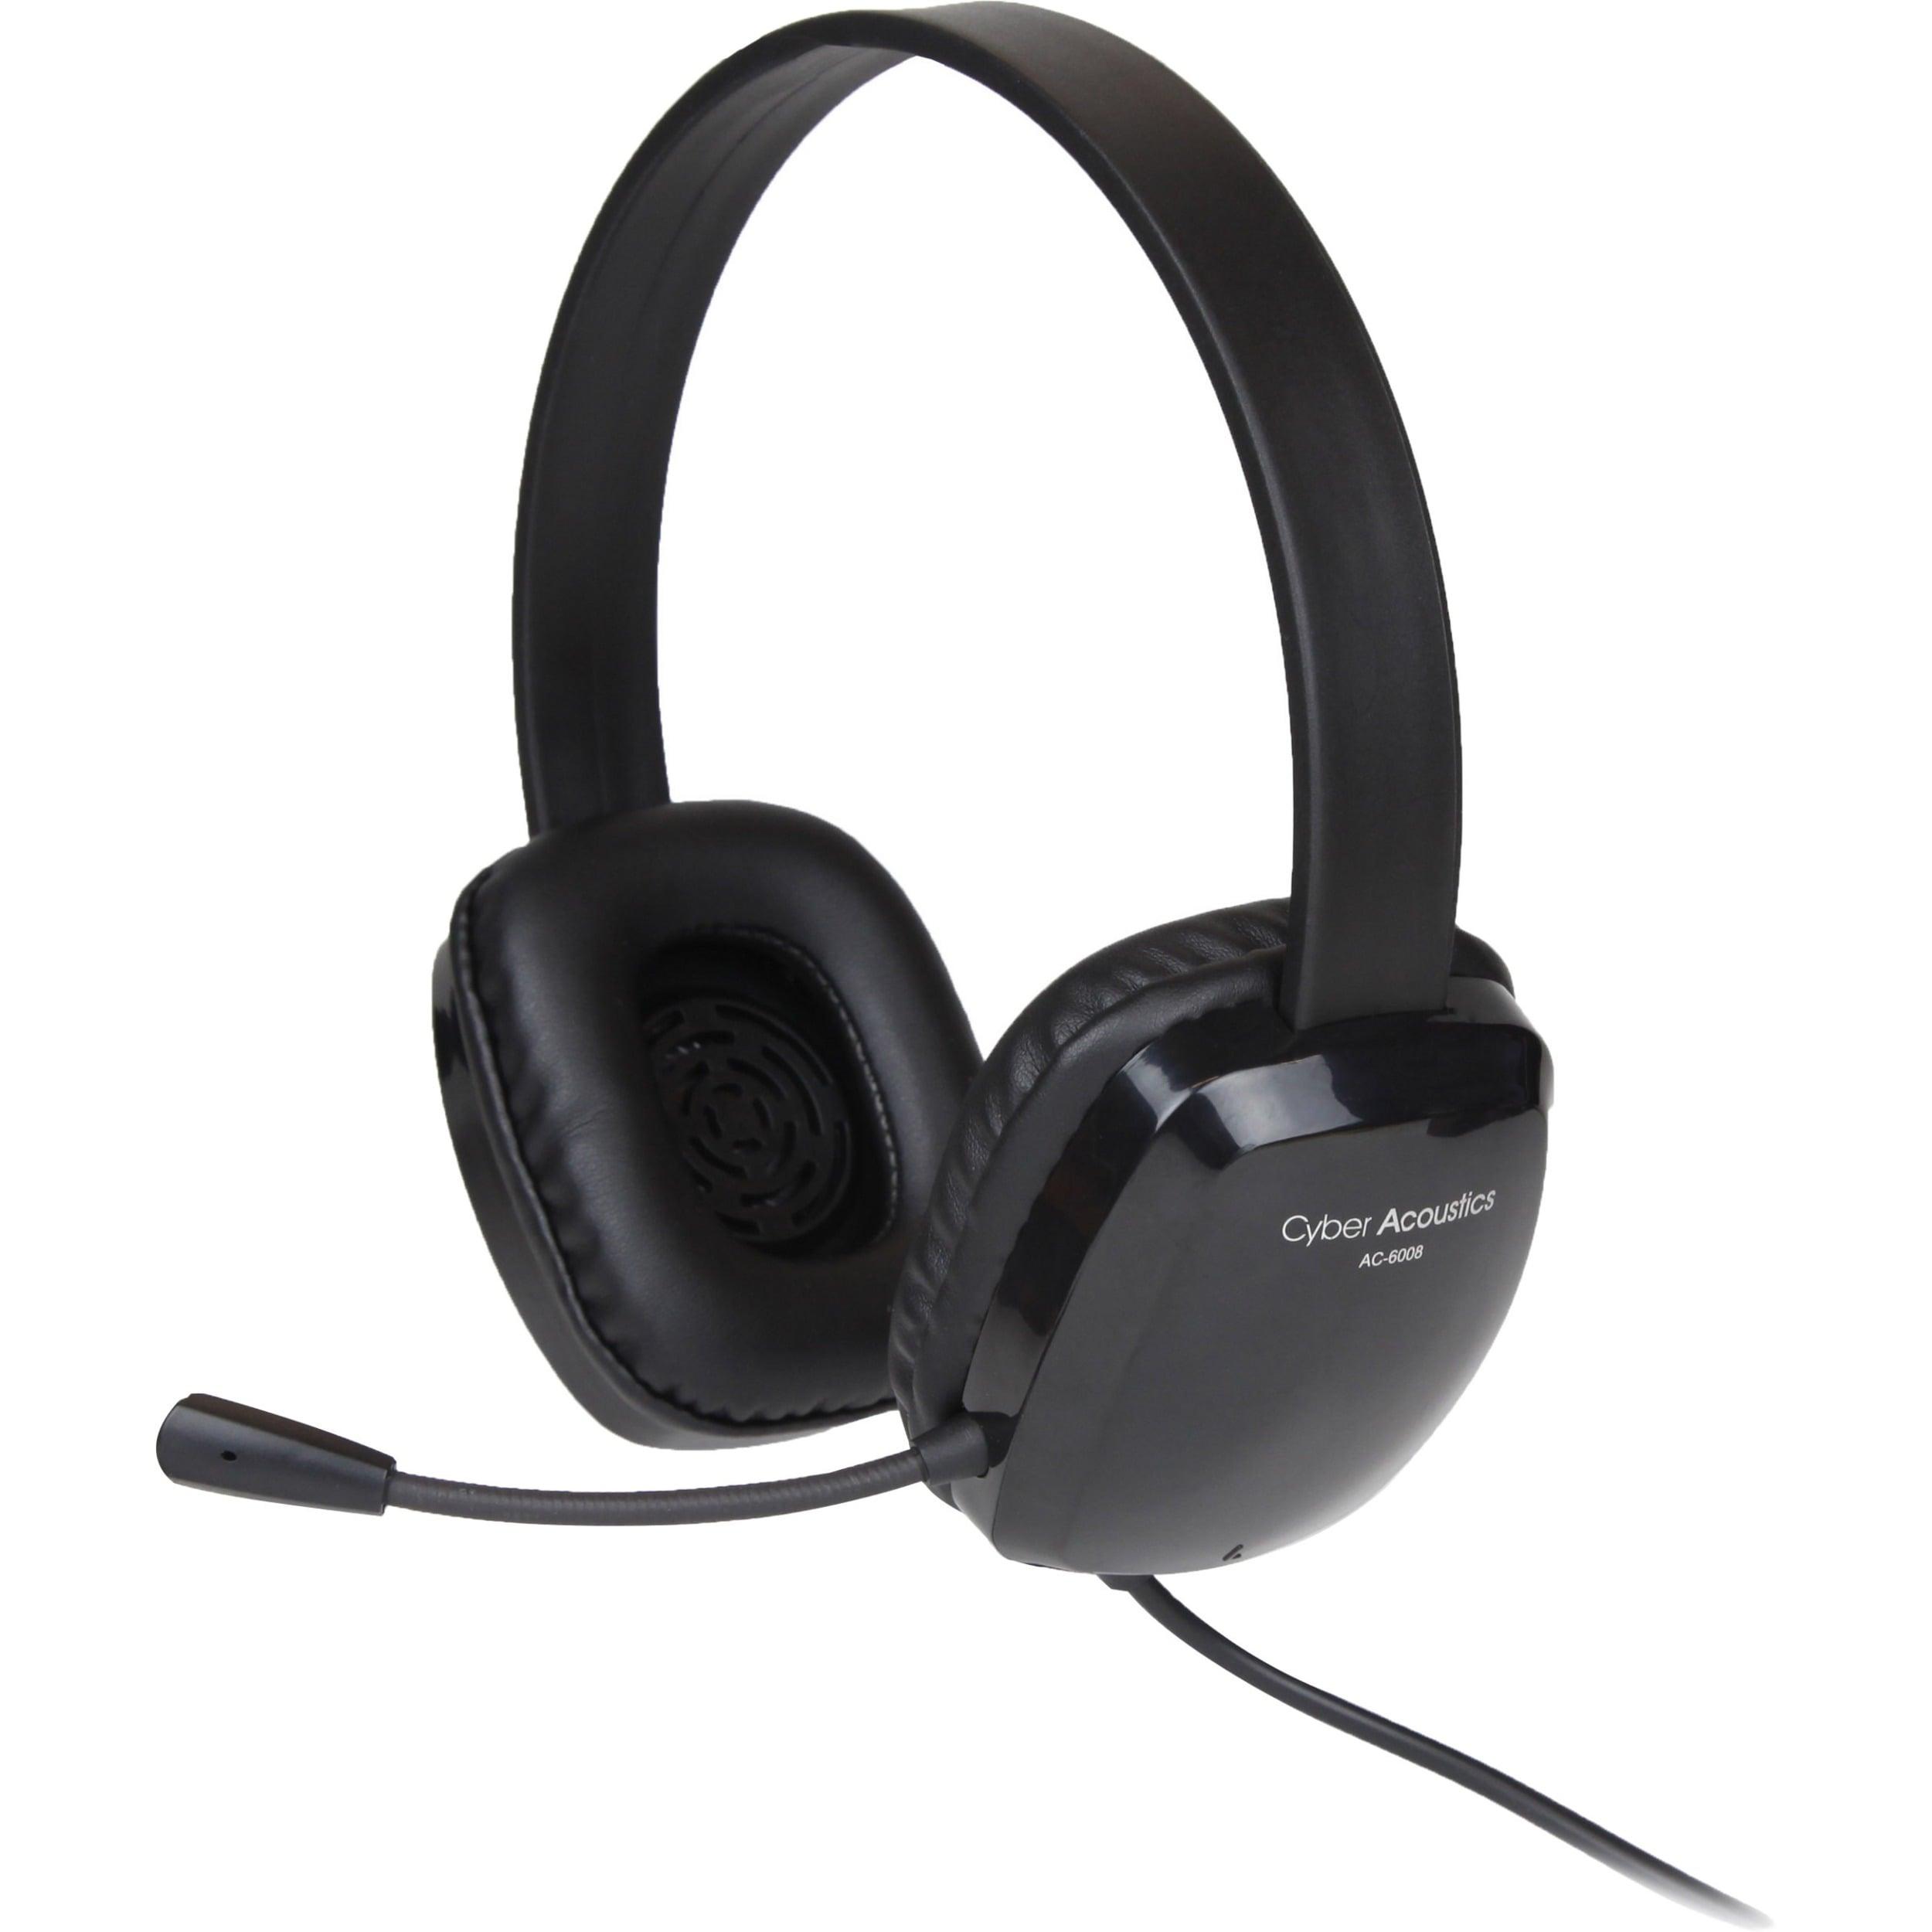 Cyber Acoustics Stereo Headset w/ Single Plug #AC-6008